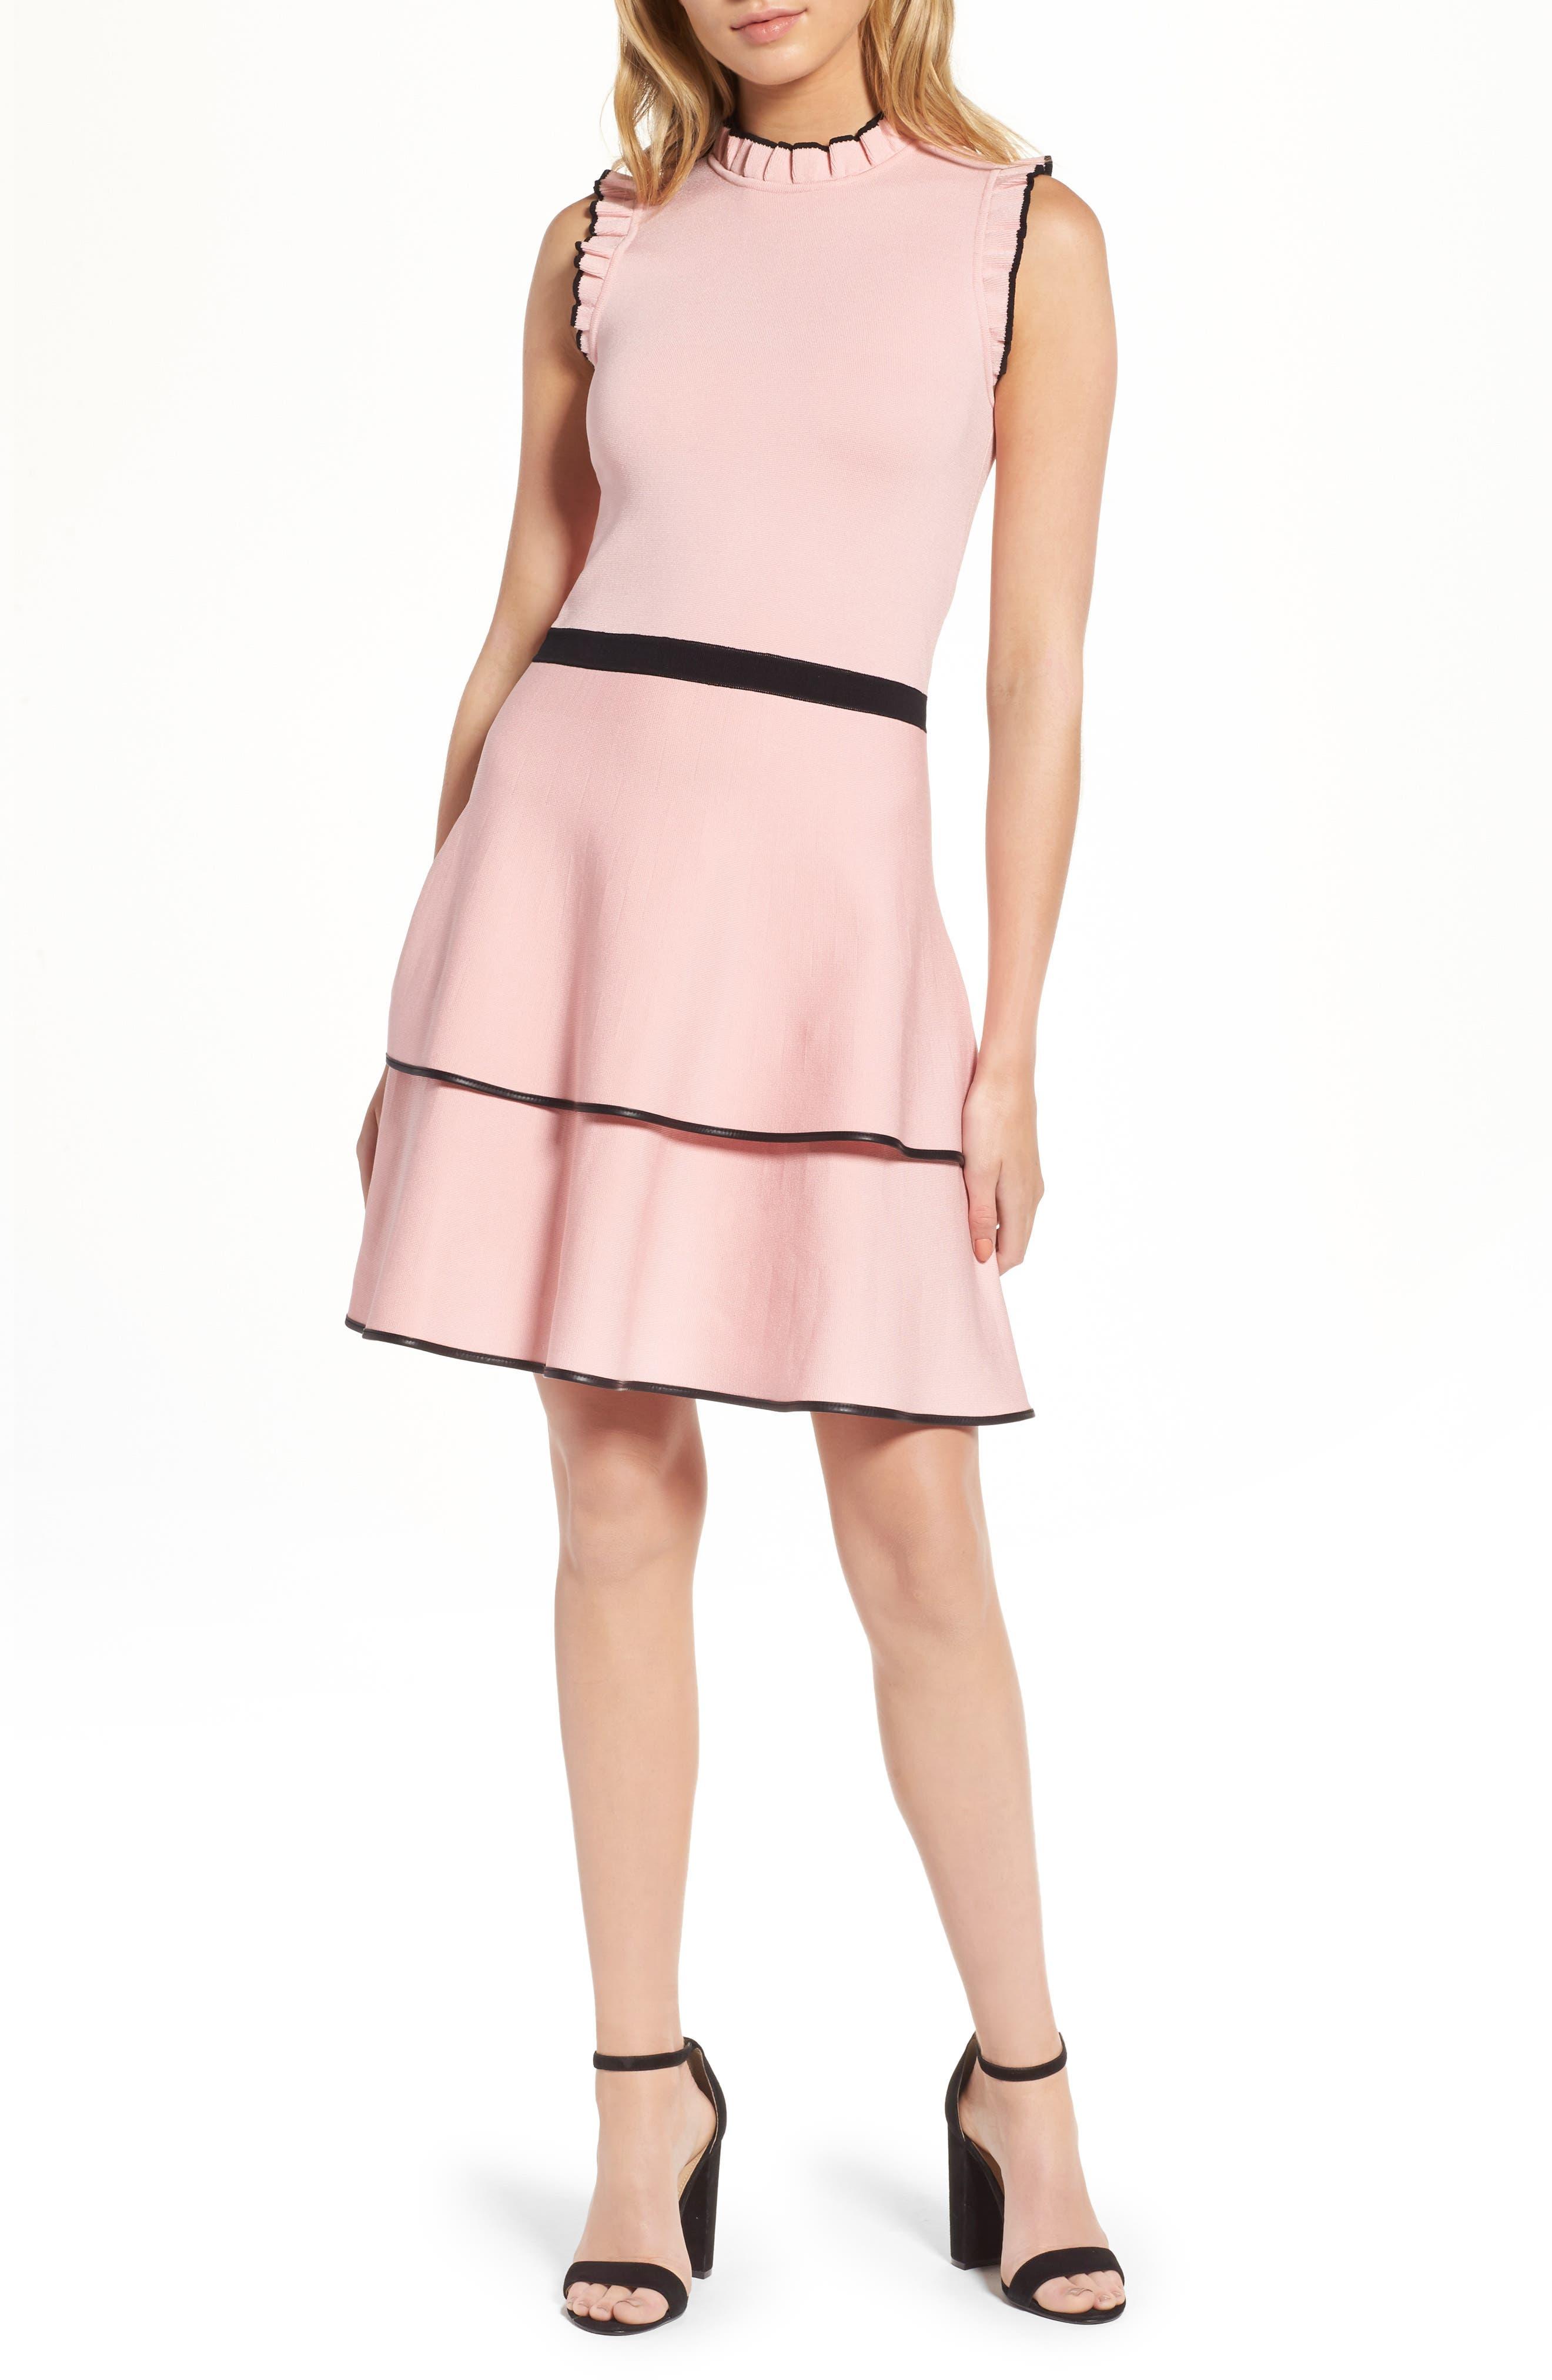 Alternate Image 1 Selected - Parker Ryker Fit & Flare Dress